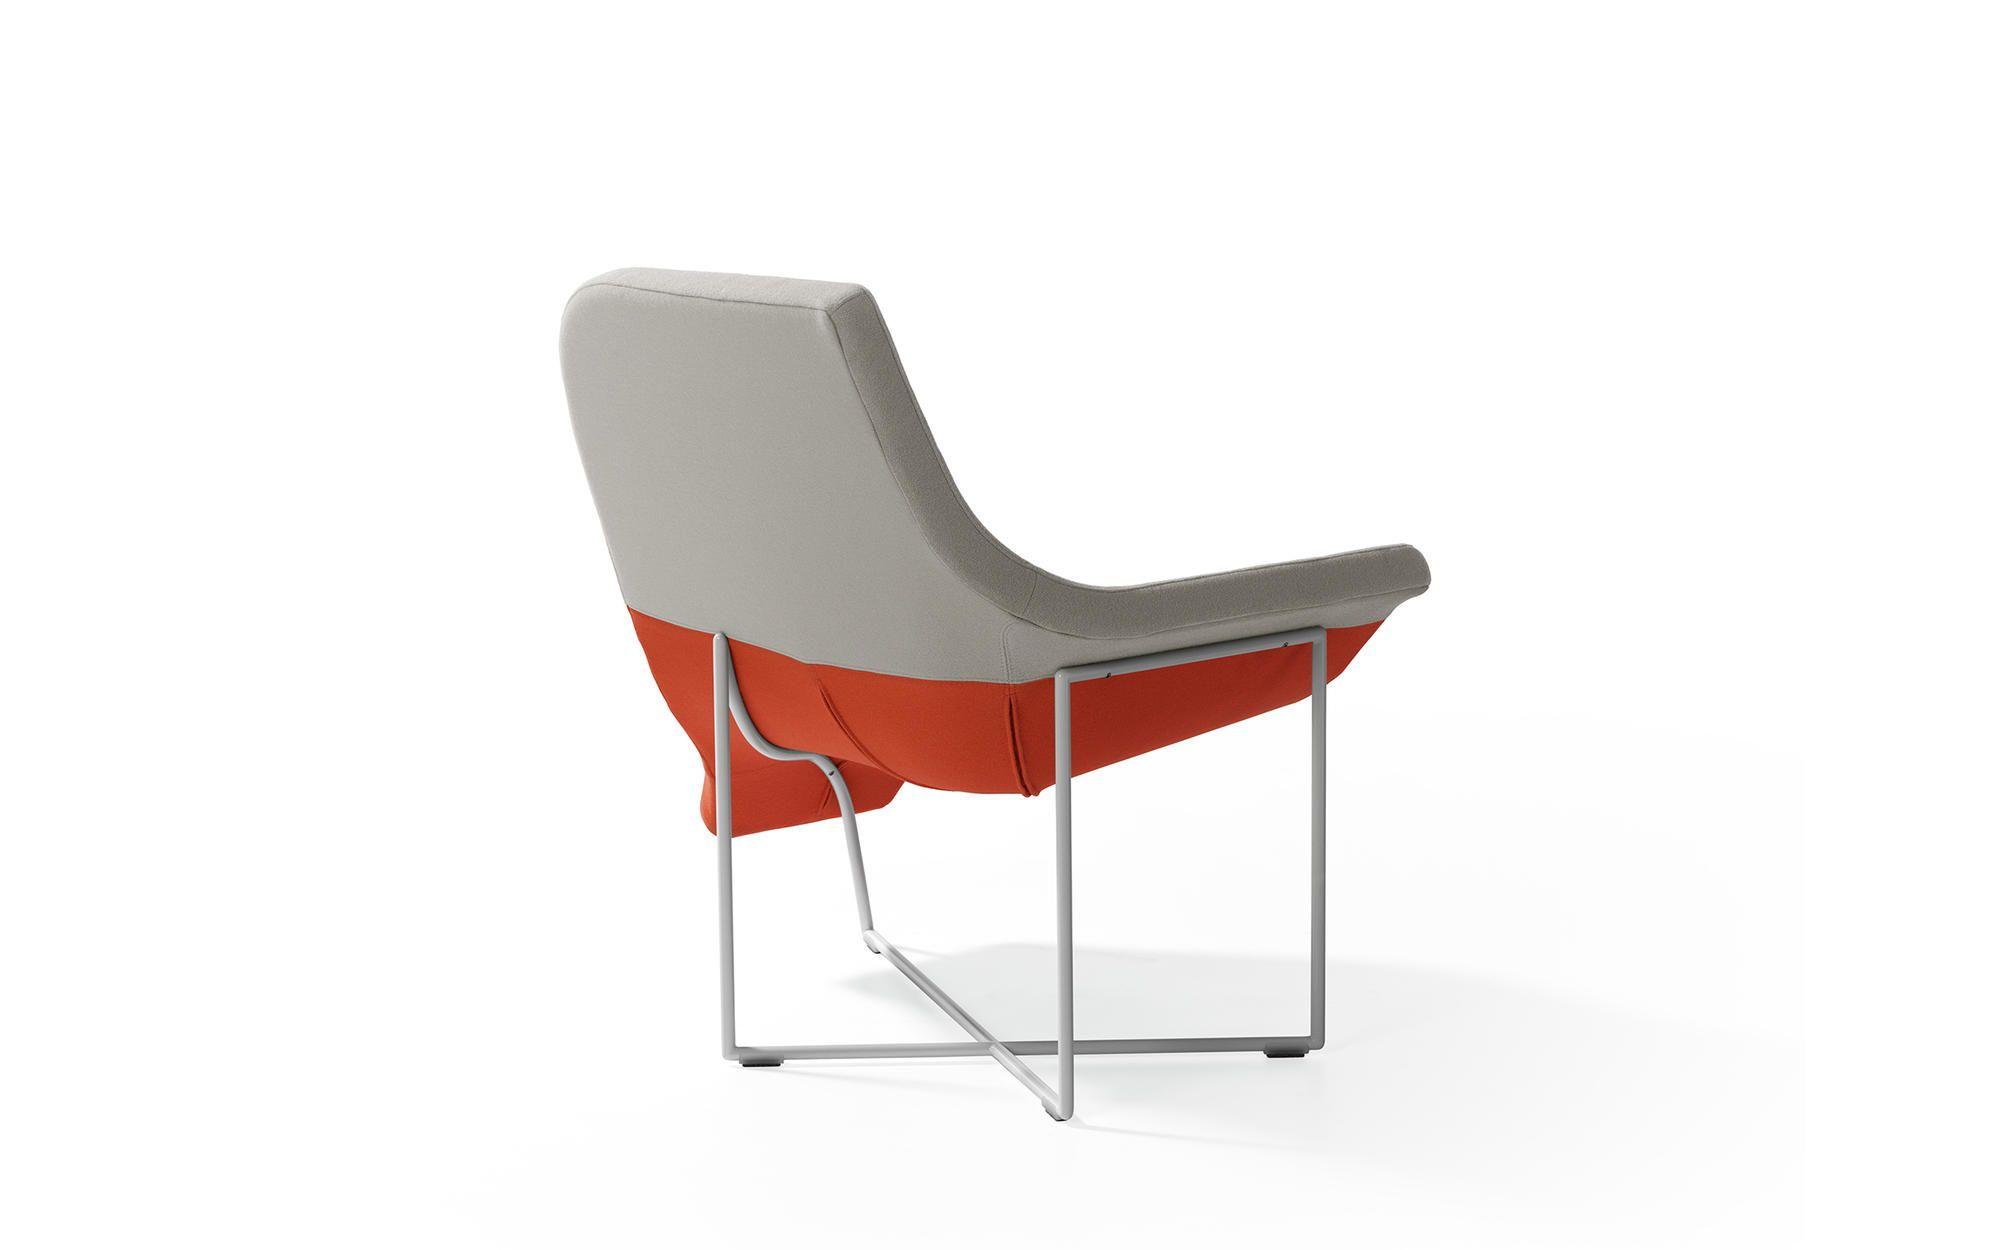 Gemini Chair Relaxing Chair Seating